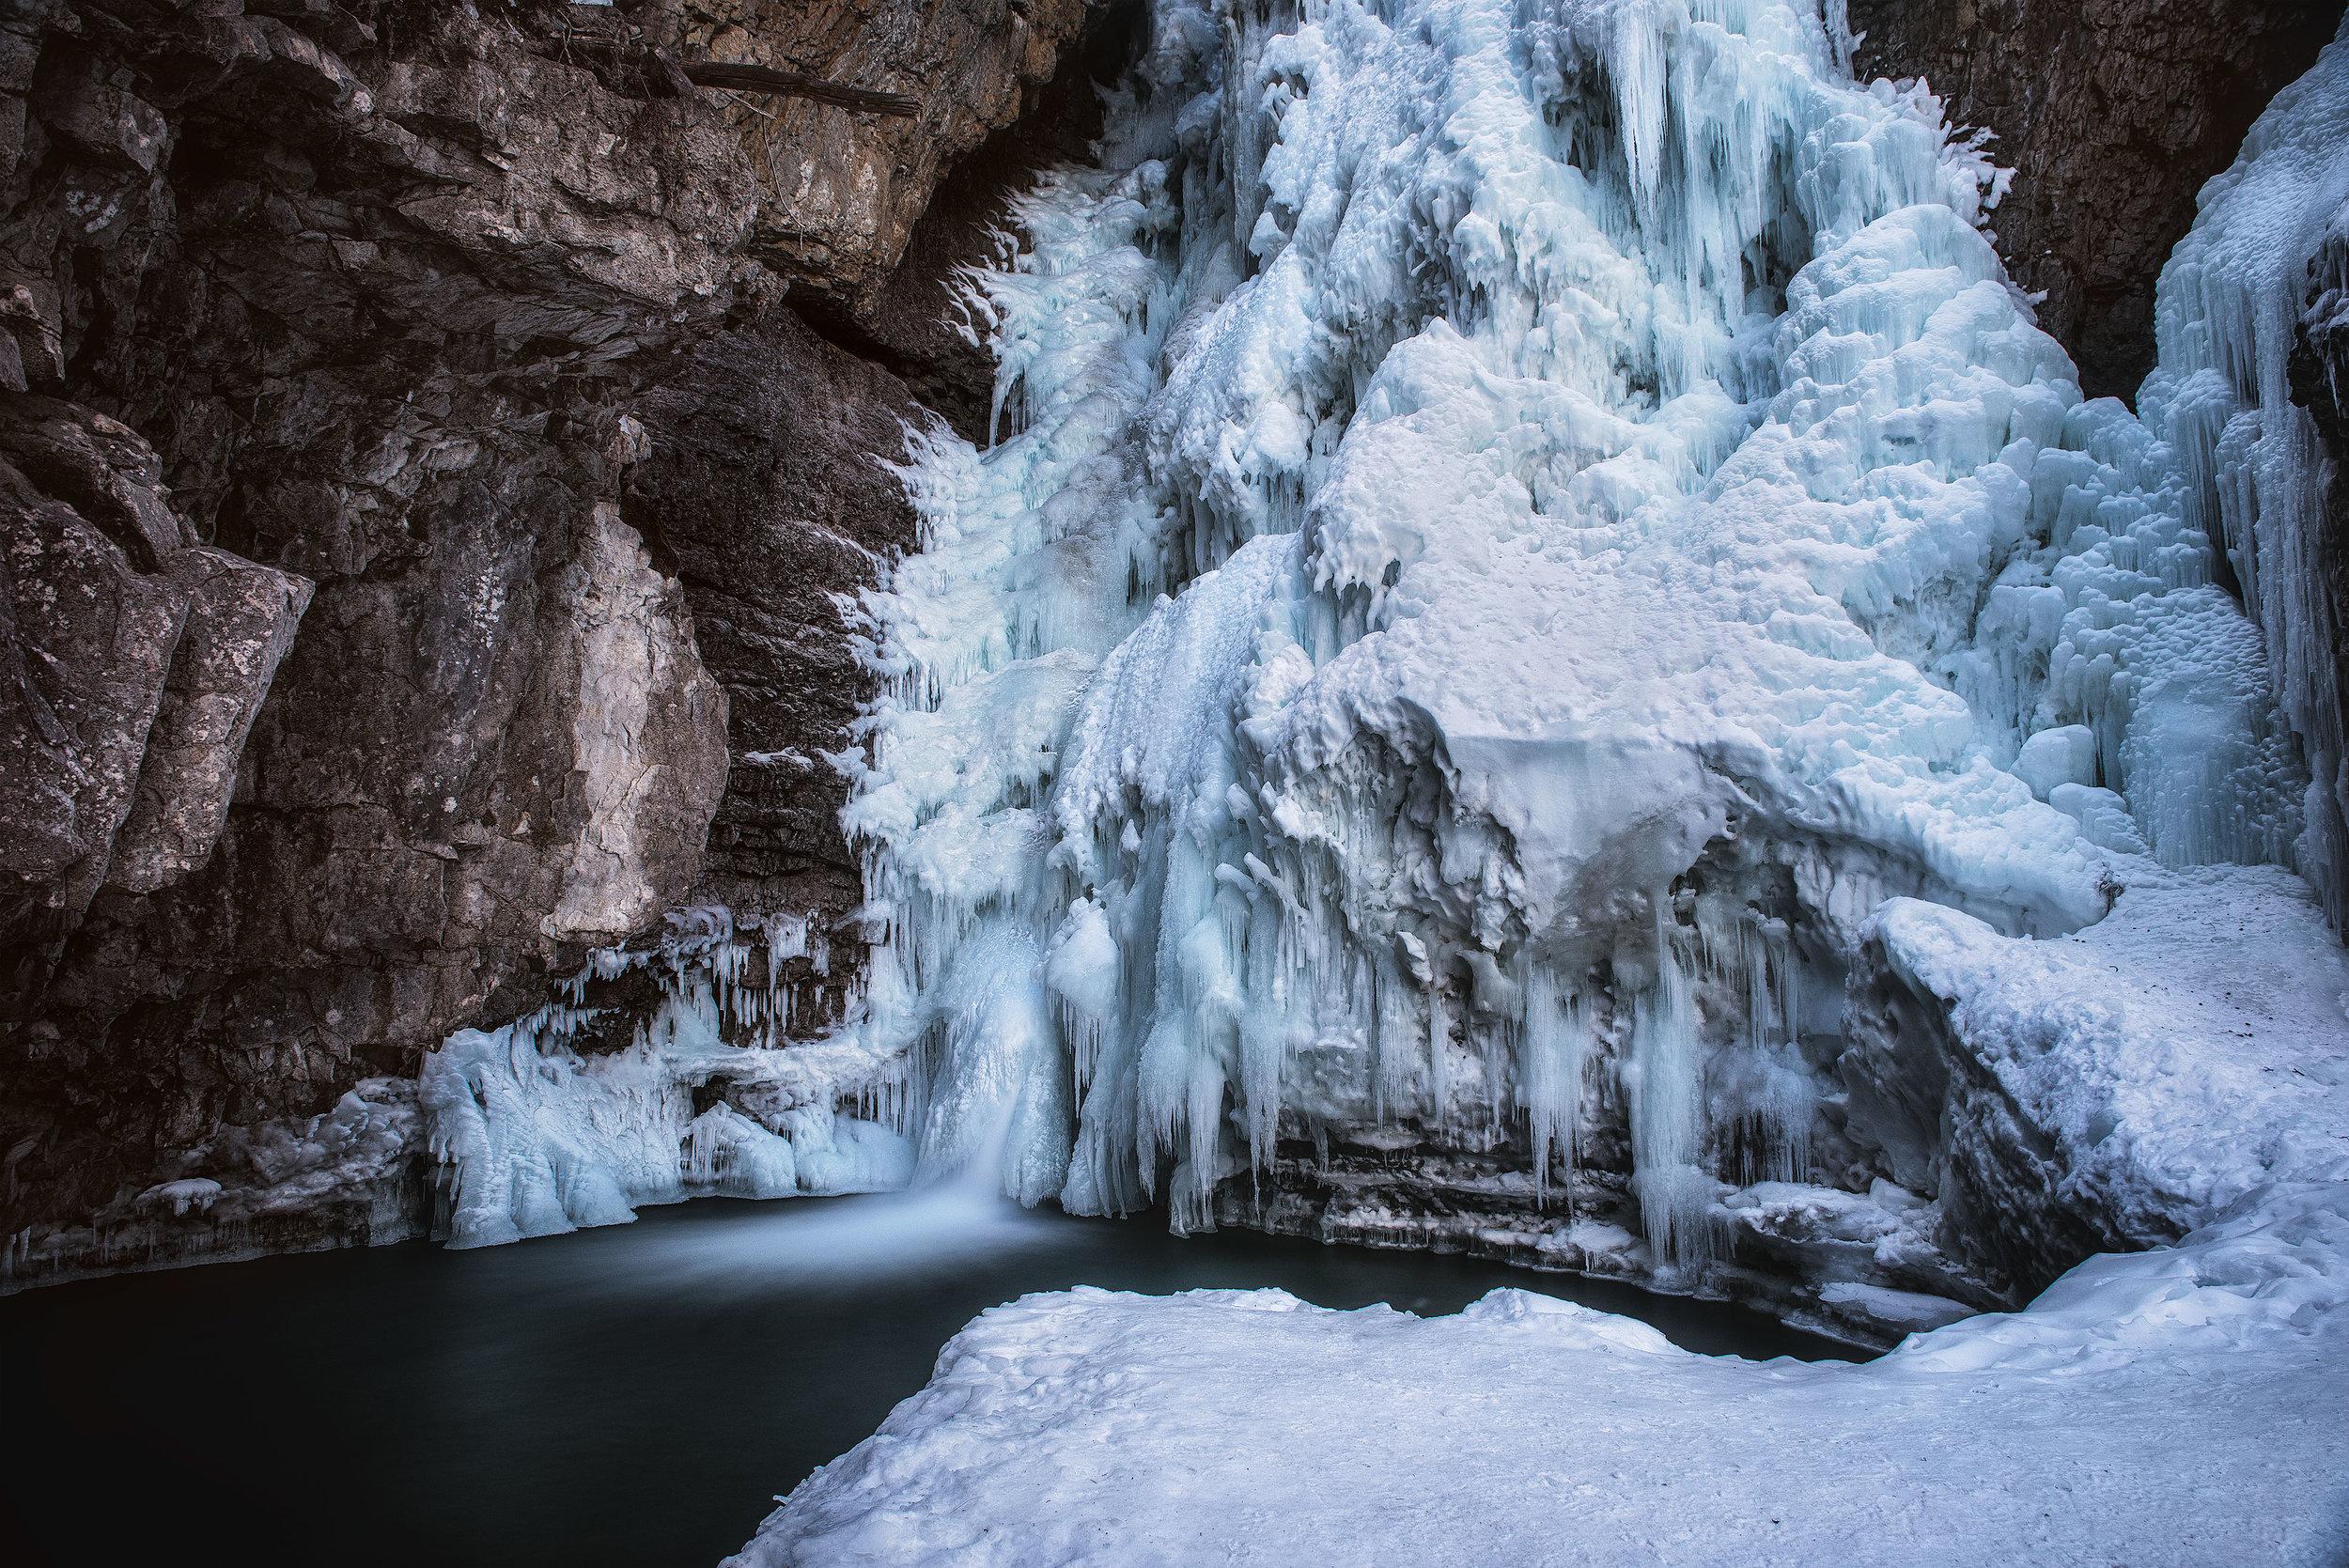 austin-trigg-ice-climbing-banff-Johnston-Falls.jpg